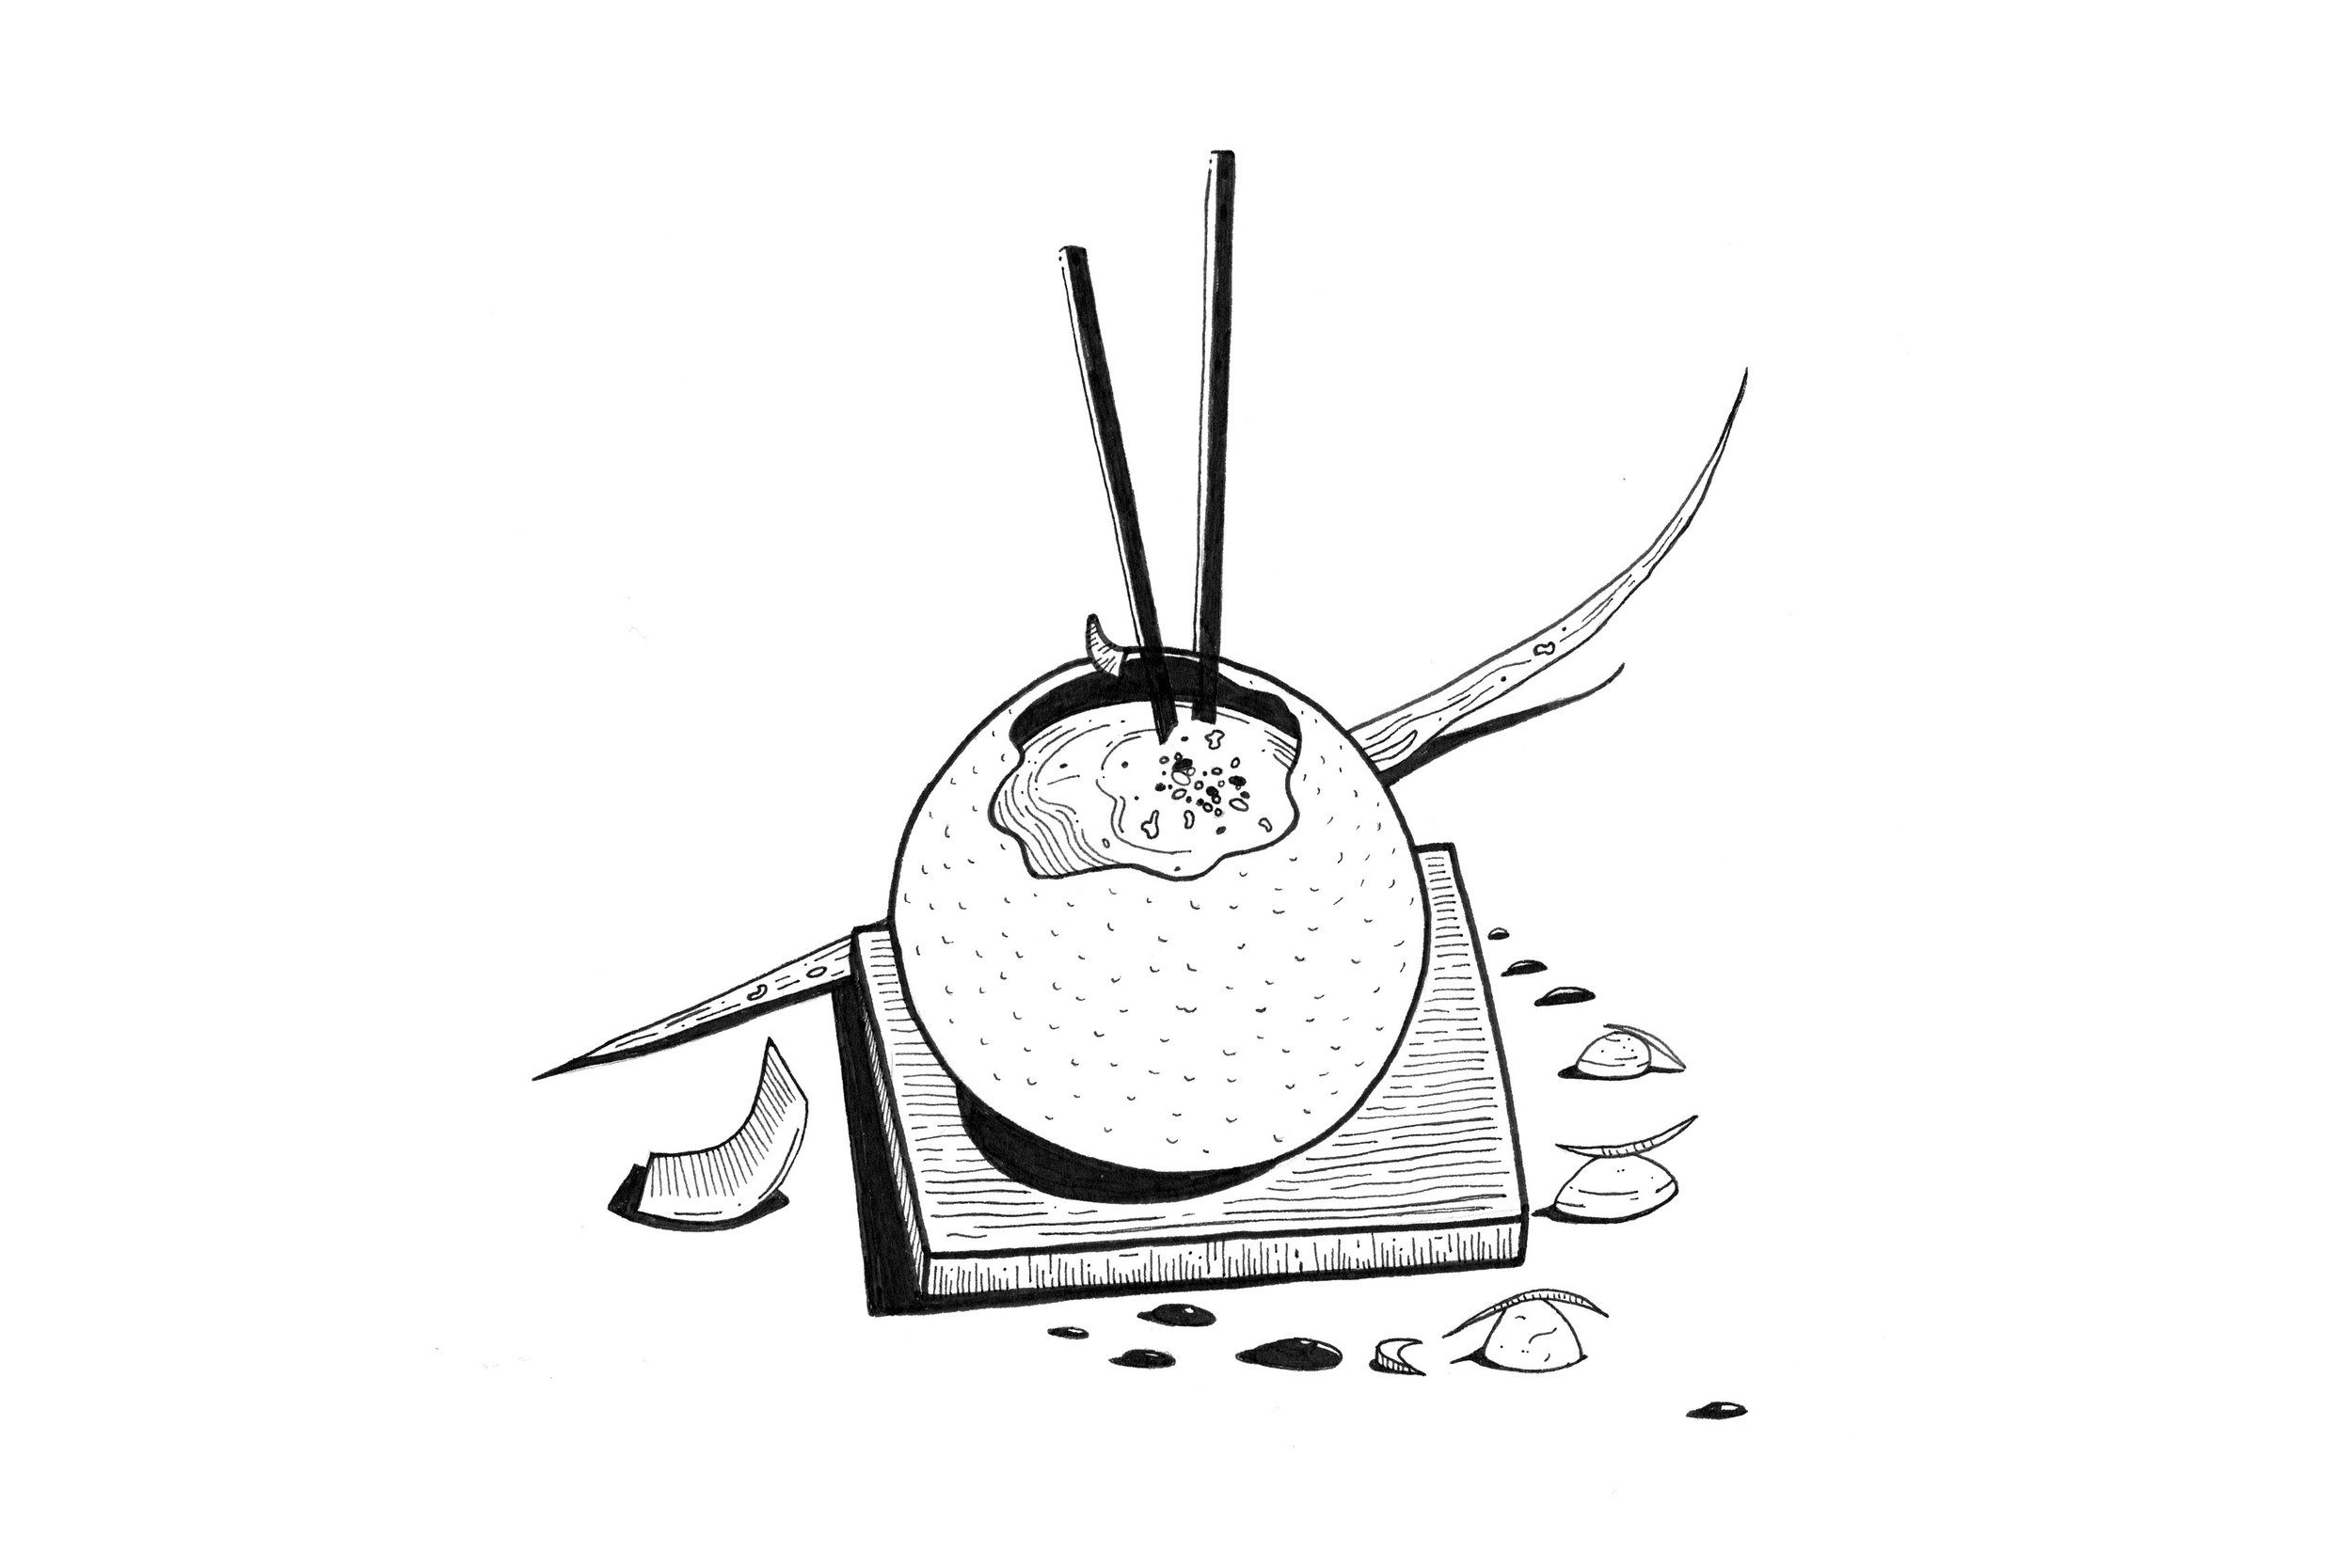 5x7 in Doodle